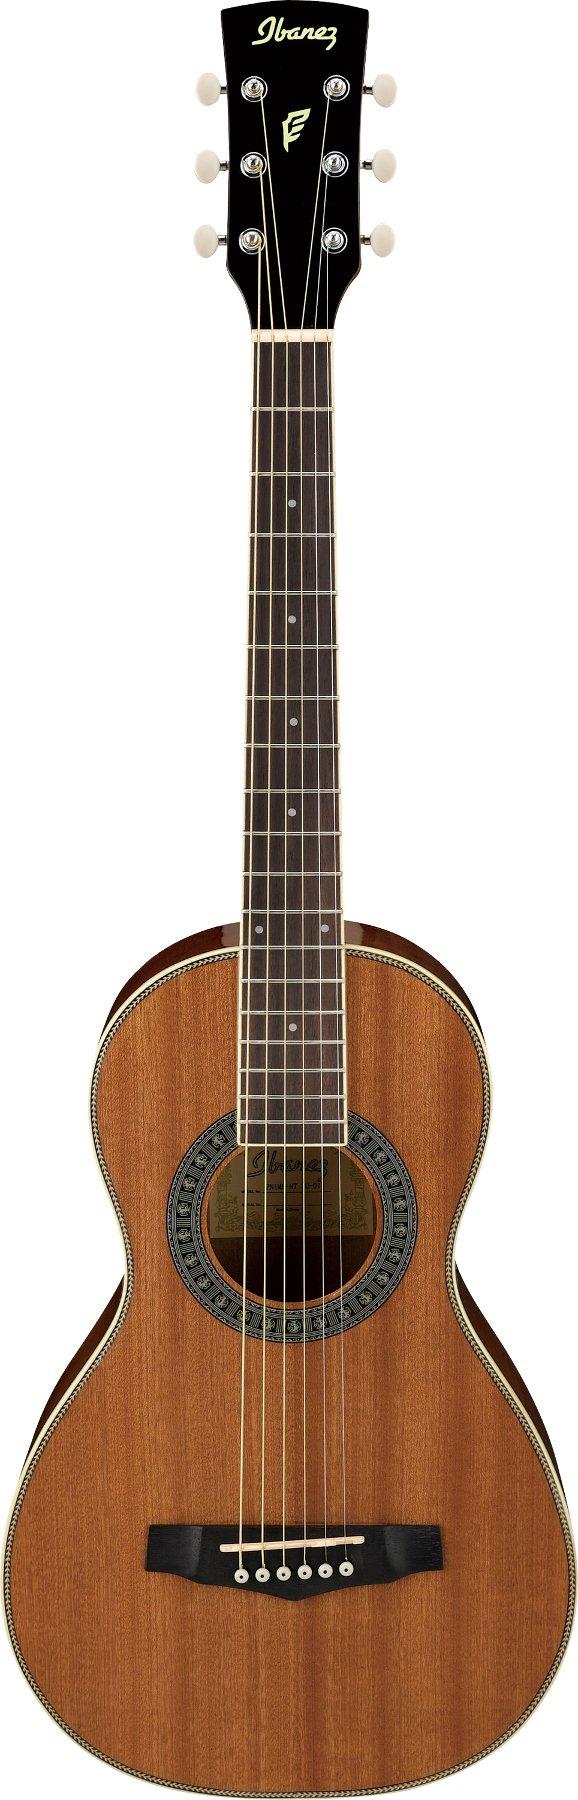 Performance Parlor Acoustic Guitar - Natural High Gloss